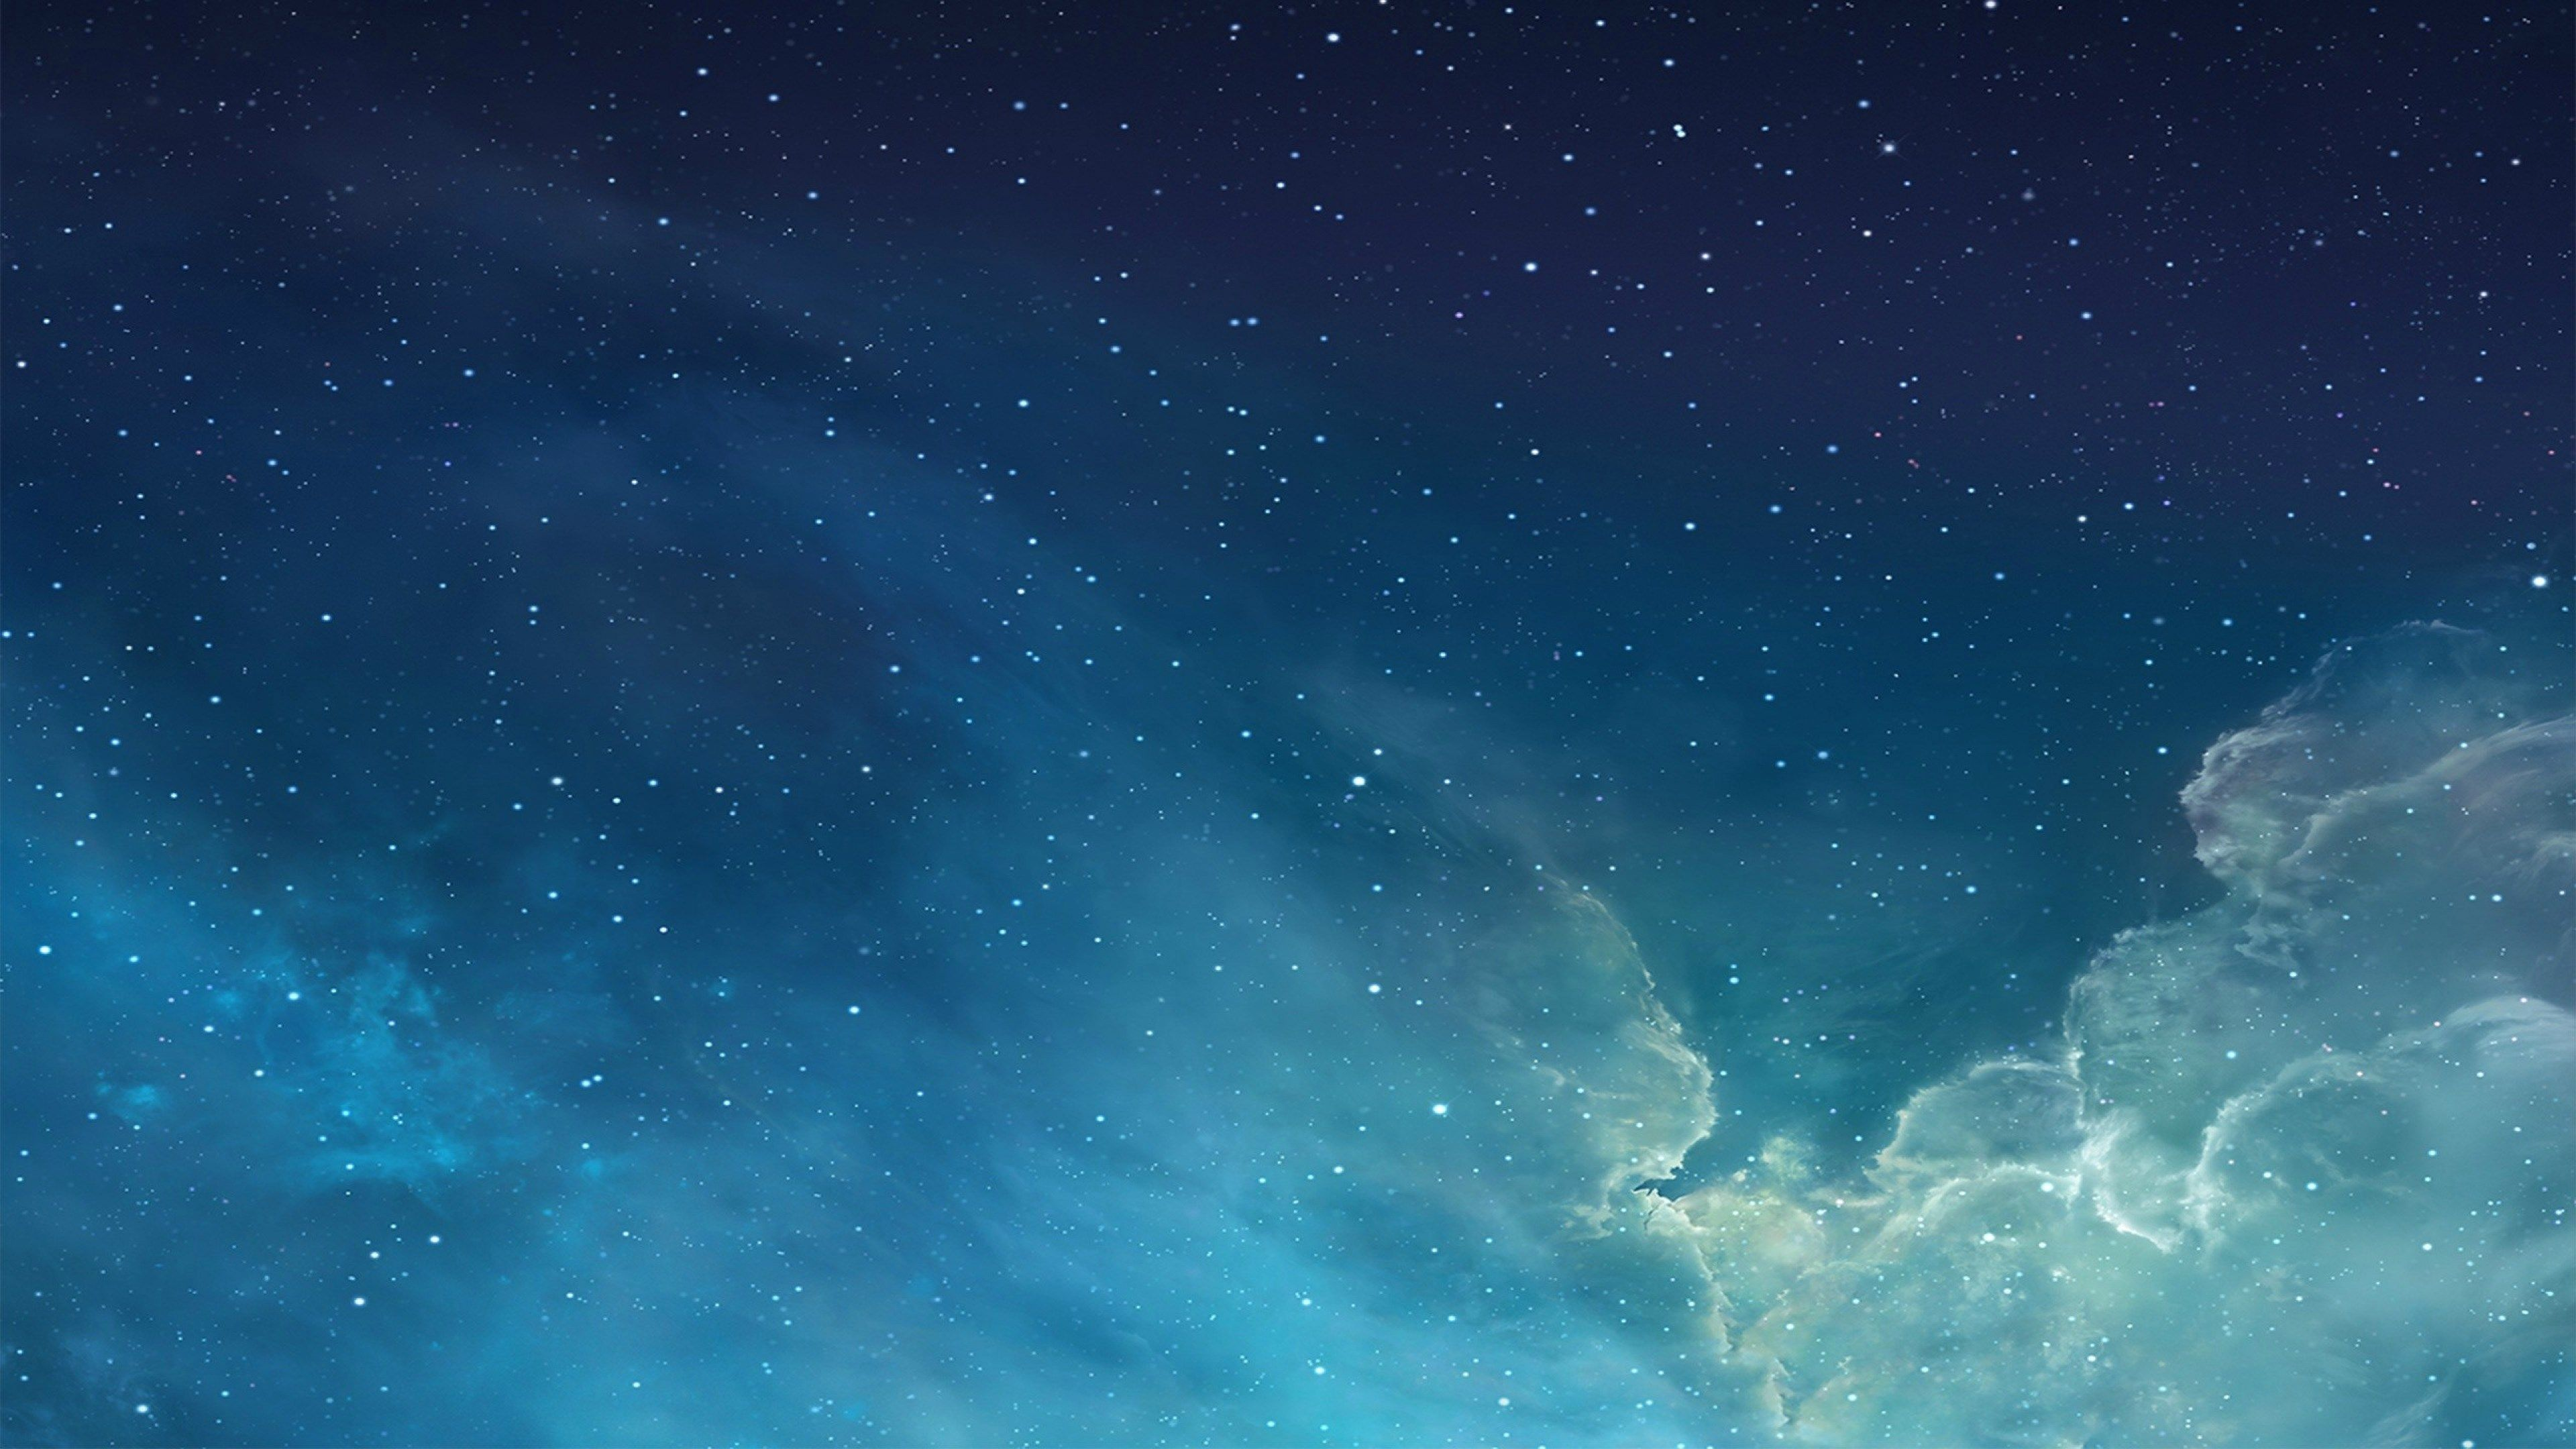 Macosx Originial Computer Wallpaper Hd Wallpaper Desktop Galaxy Wallpaper Blue Sky Wallpaper